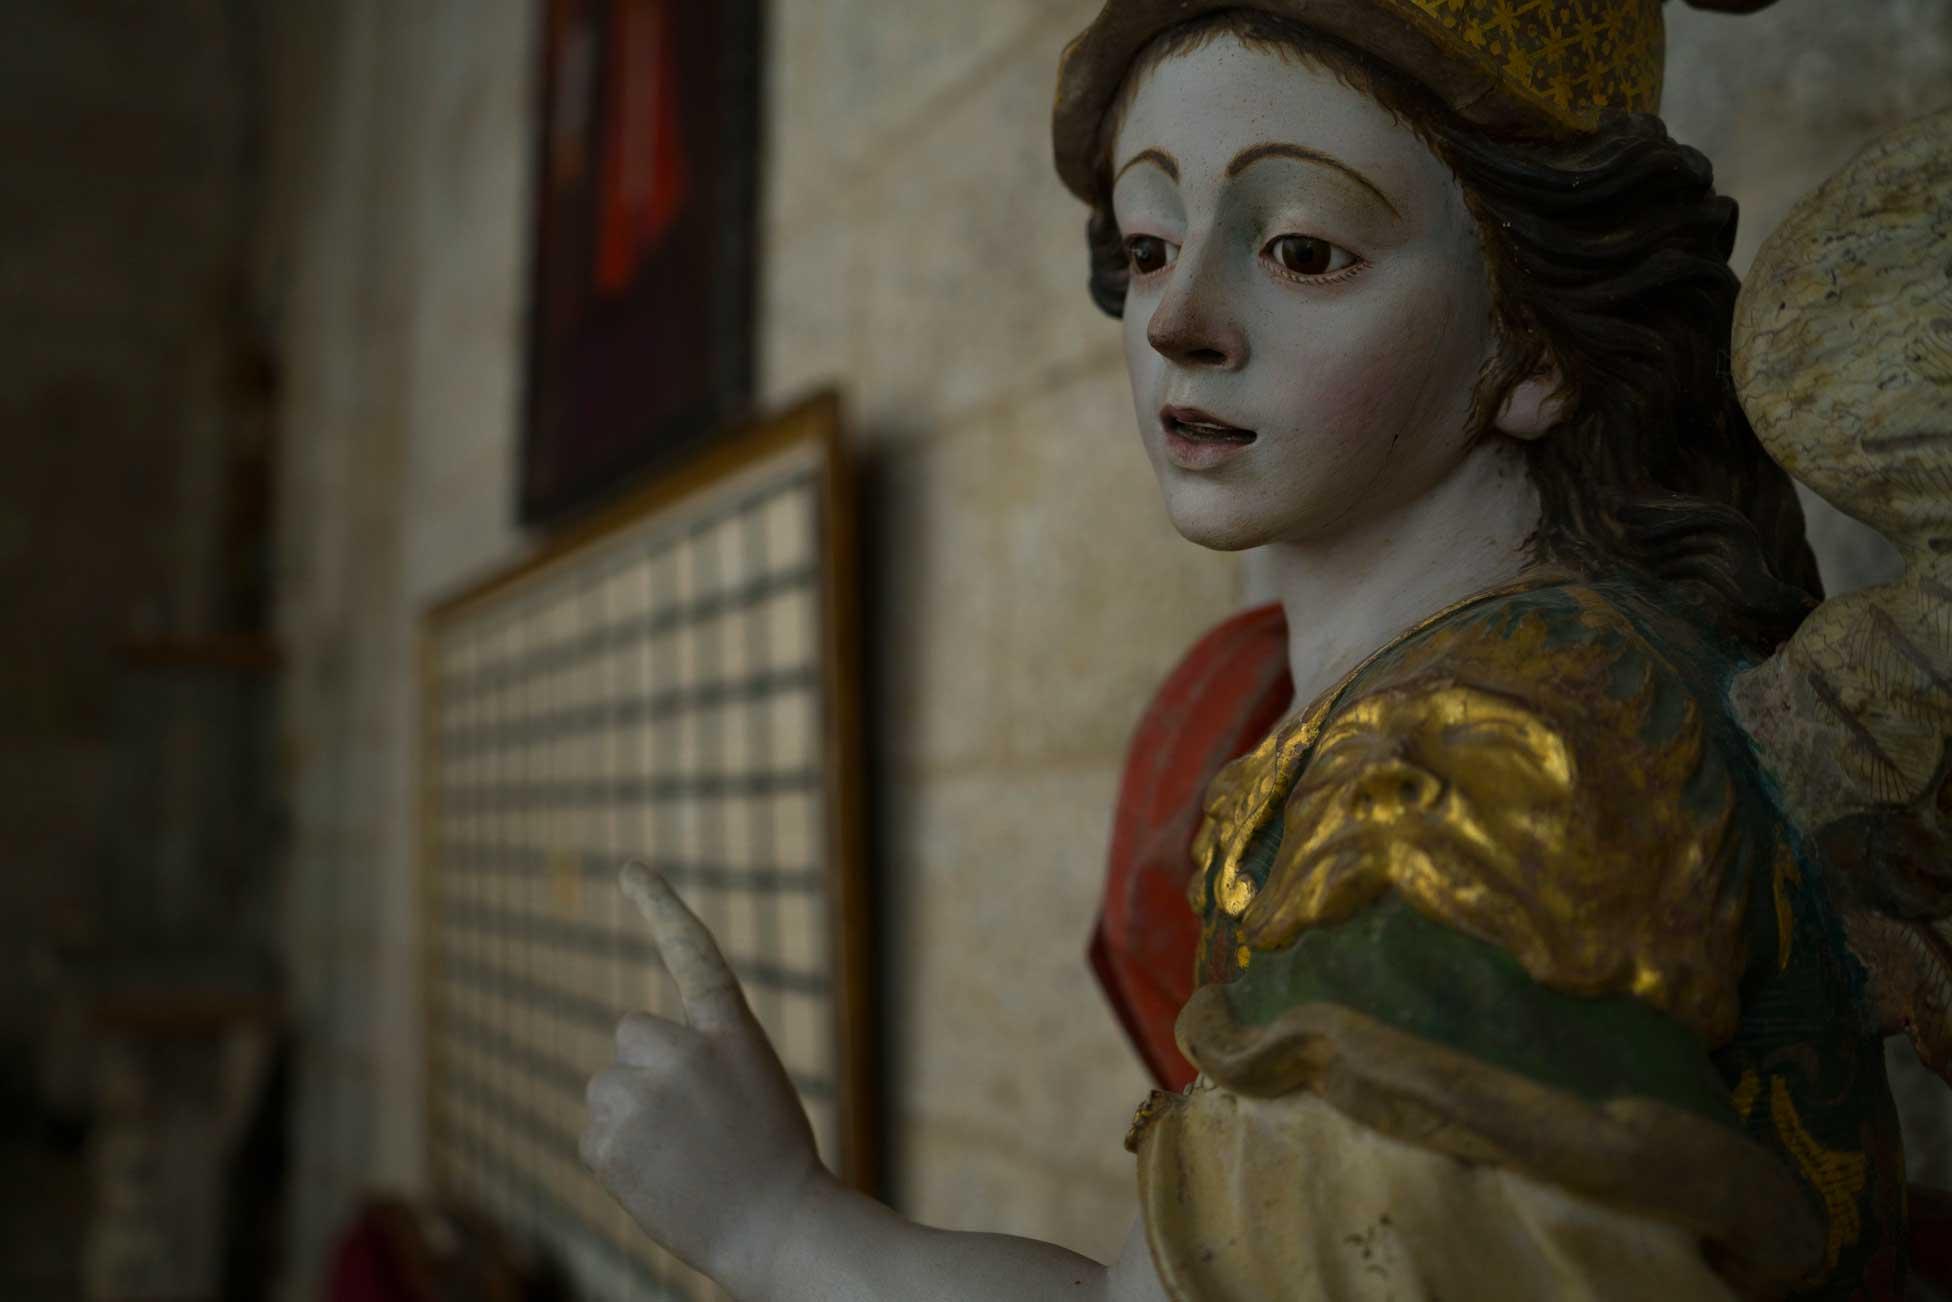 Archangel San Miguel